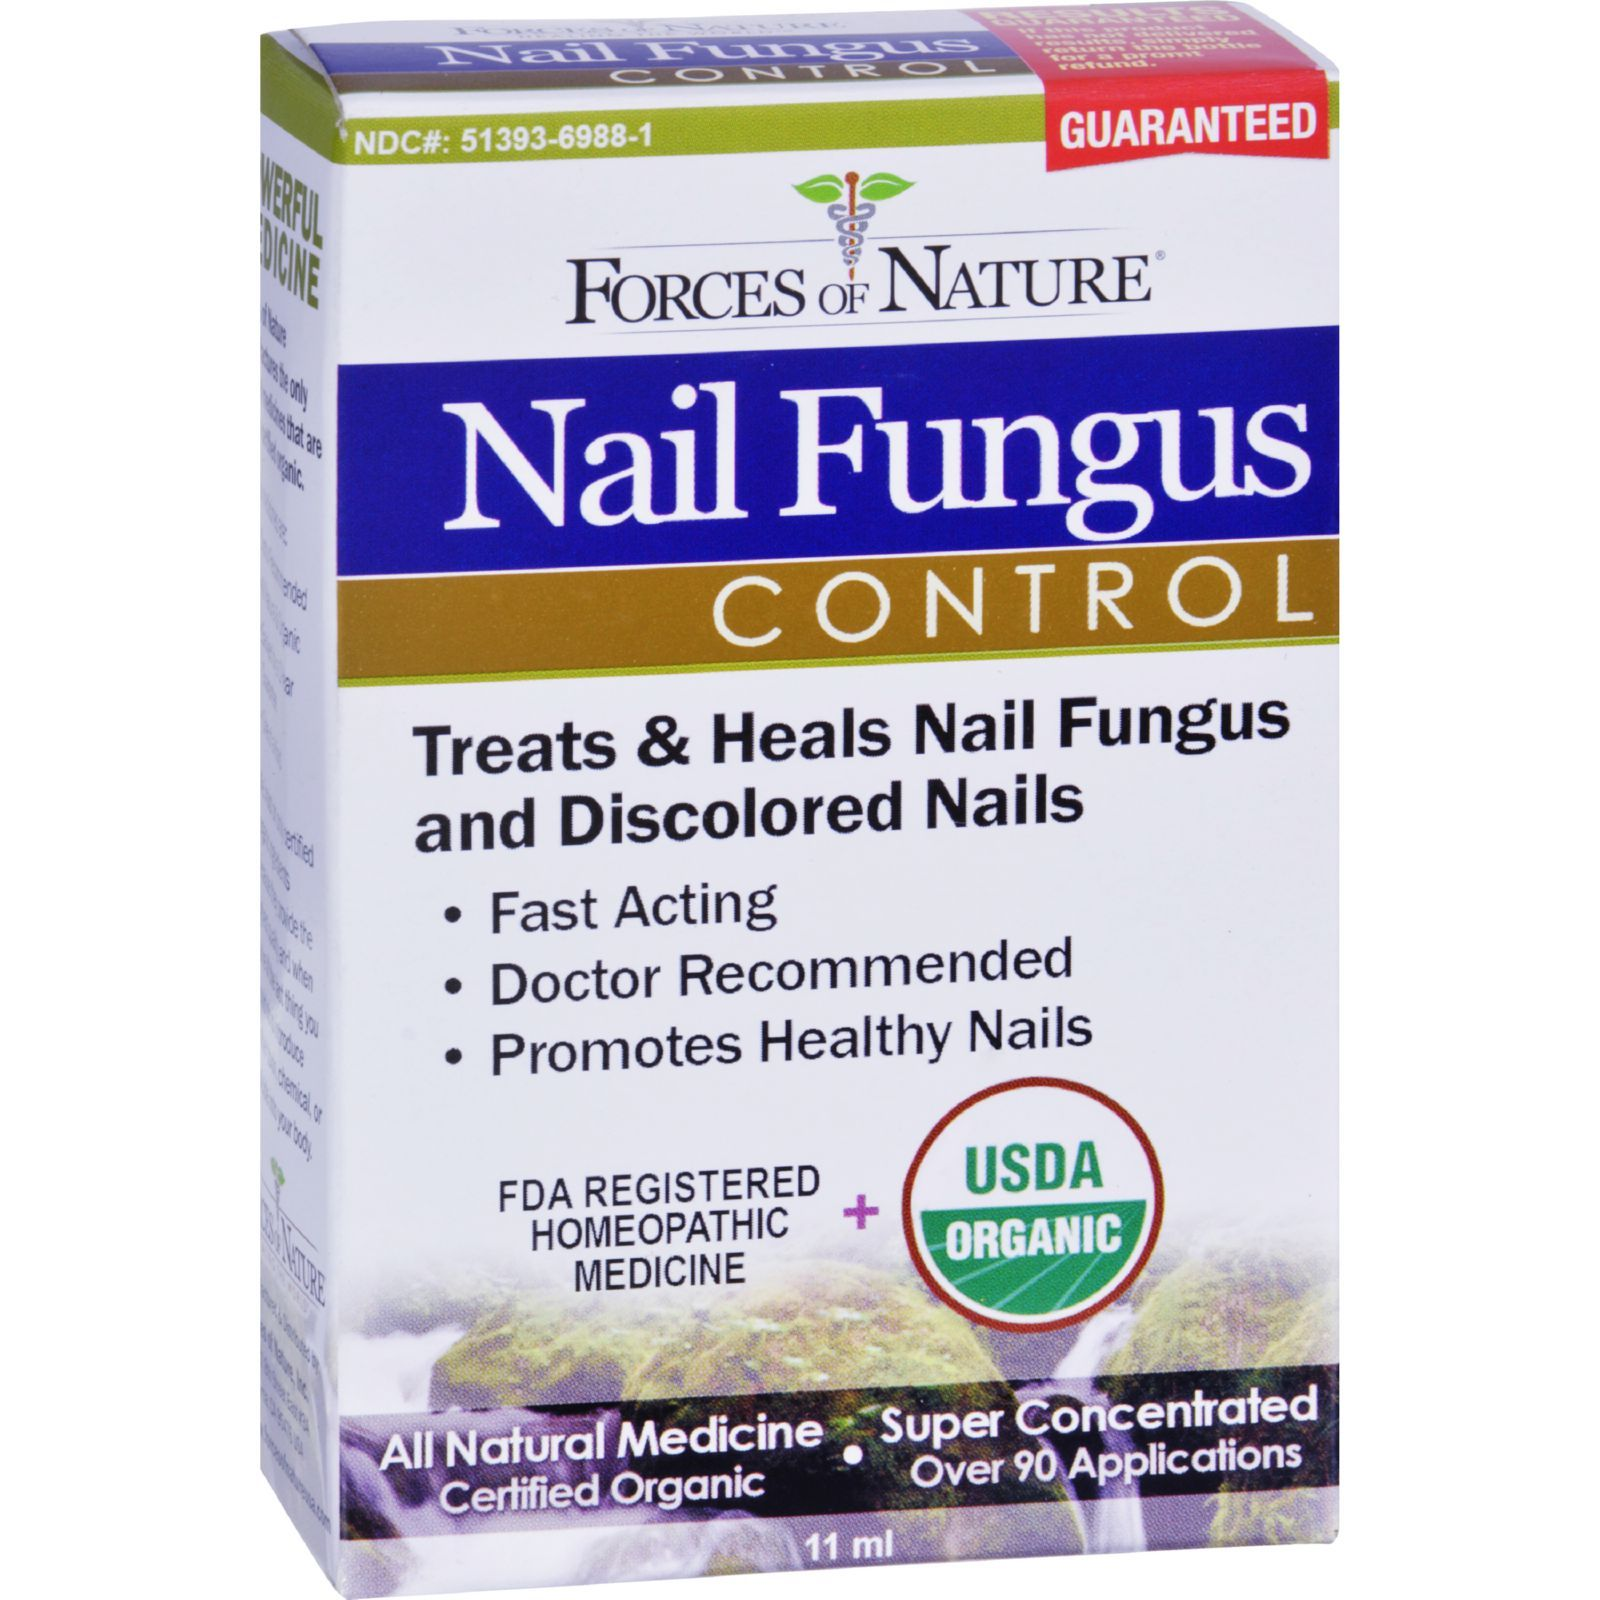 Unique Medicine For Nail Fungus Photos - Nail Art Ideas - morihati.com